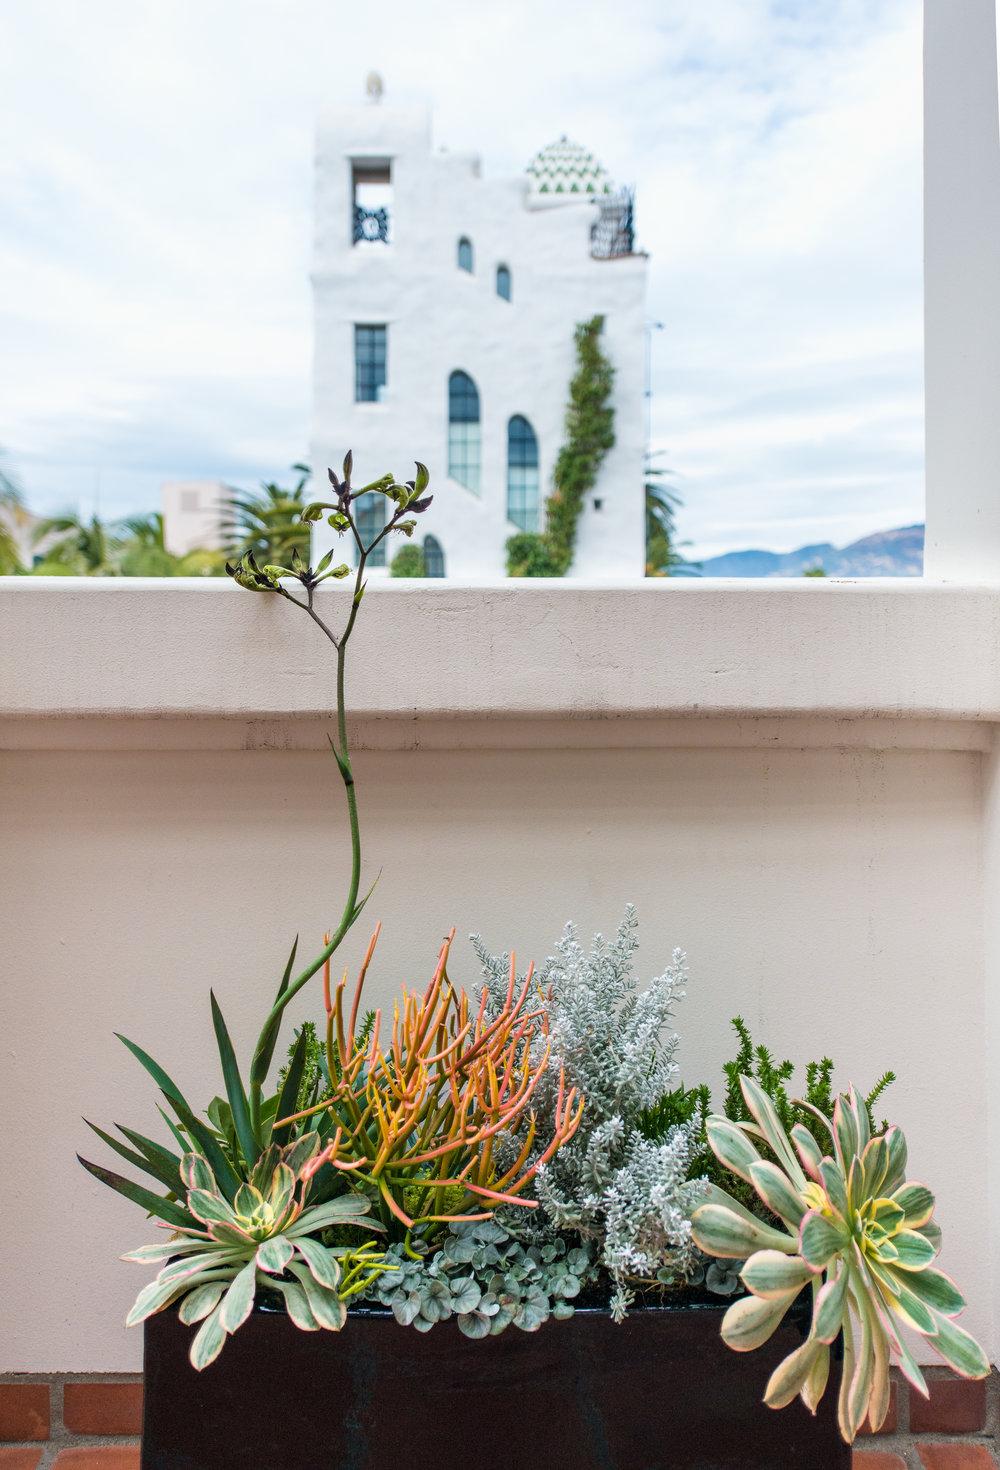 22_Succulents_kangaroo_paw_outdoor_EL.jpg